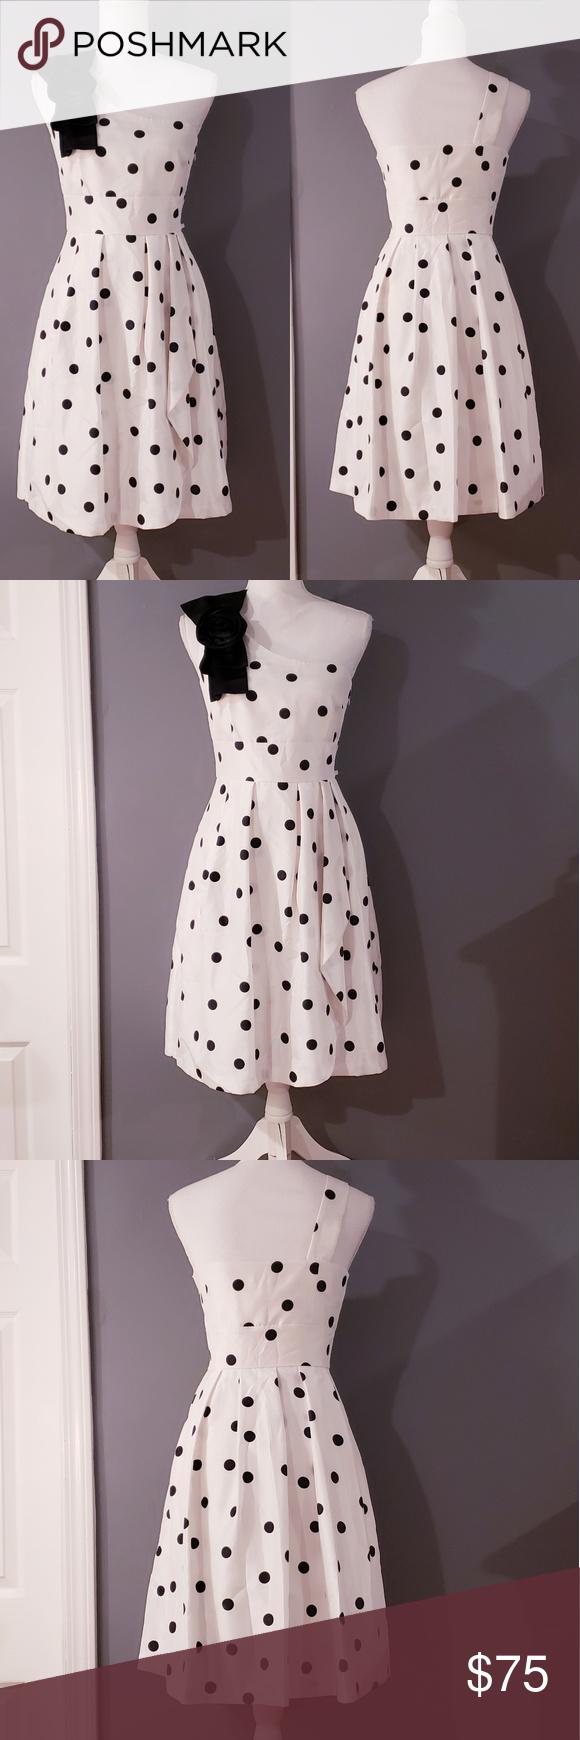 Nwot Tahari Asl Polka Dot Print One Shoulder Dress Clothes Design Fashion Tahari Dress [ 1740 x 580 Pixel ]